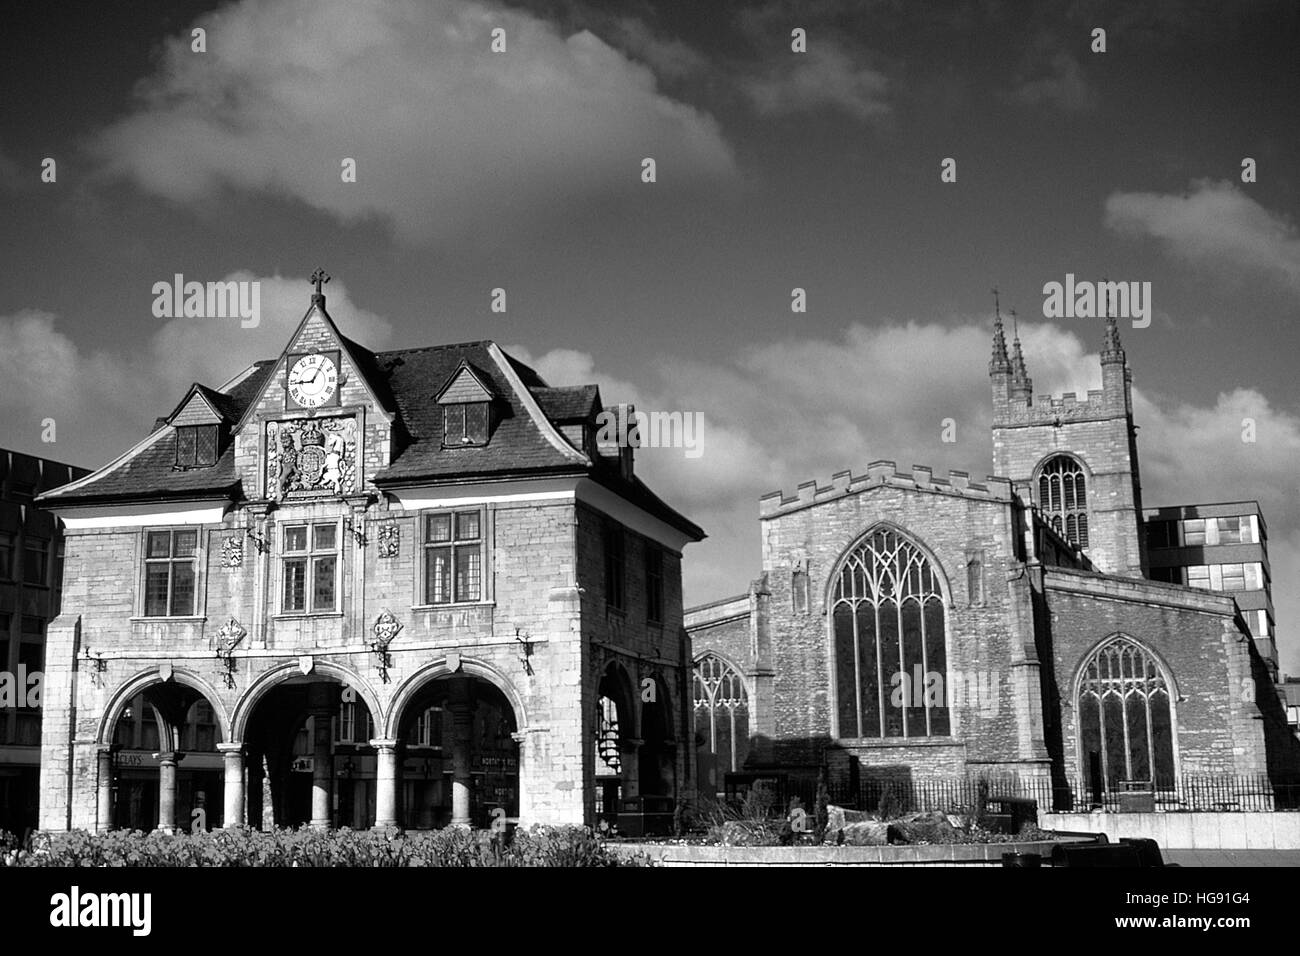 The Guildhall, Peterborough City centre, Cambridgeshire. - Stock Image